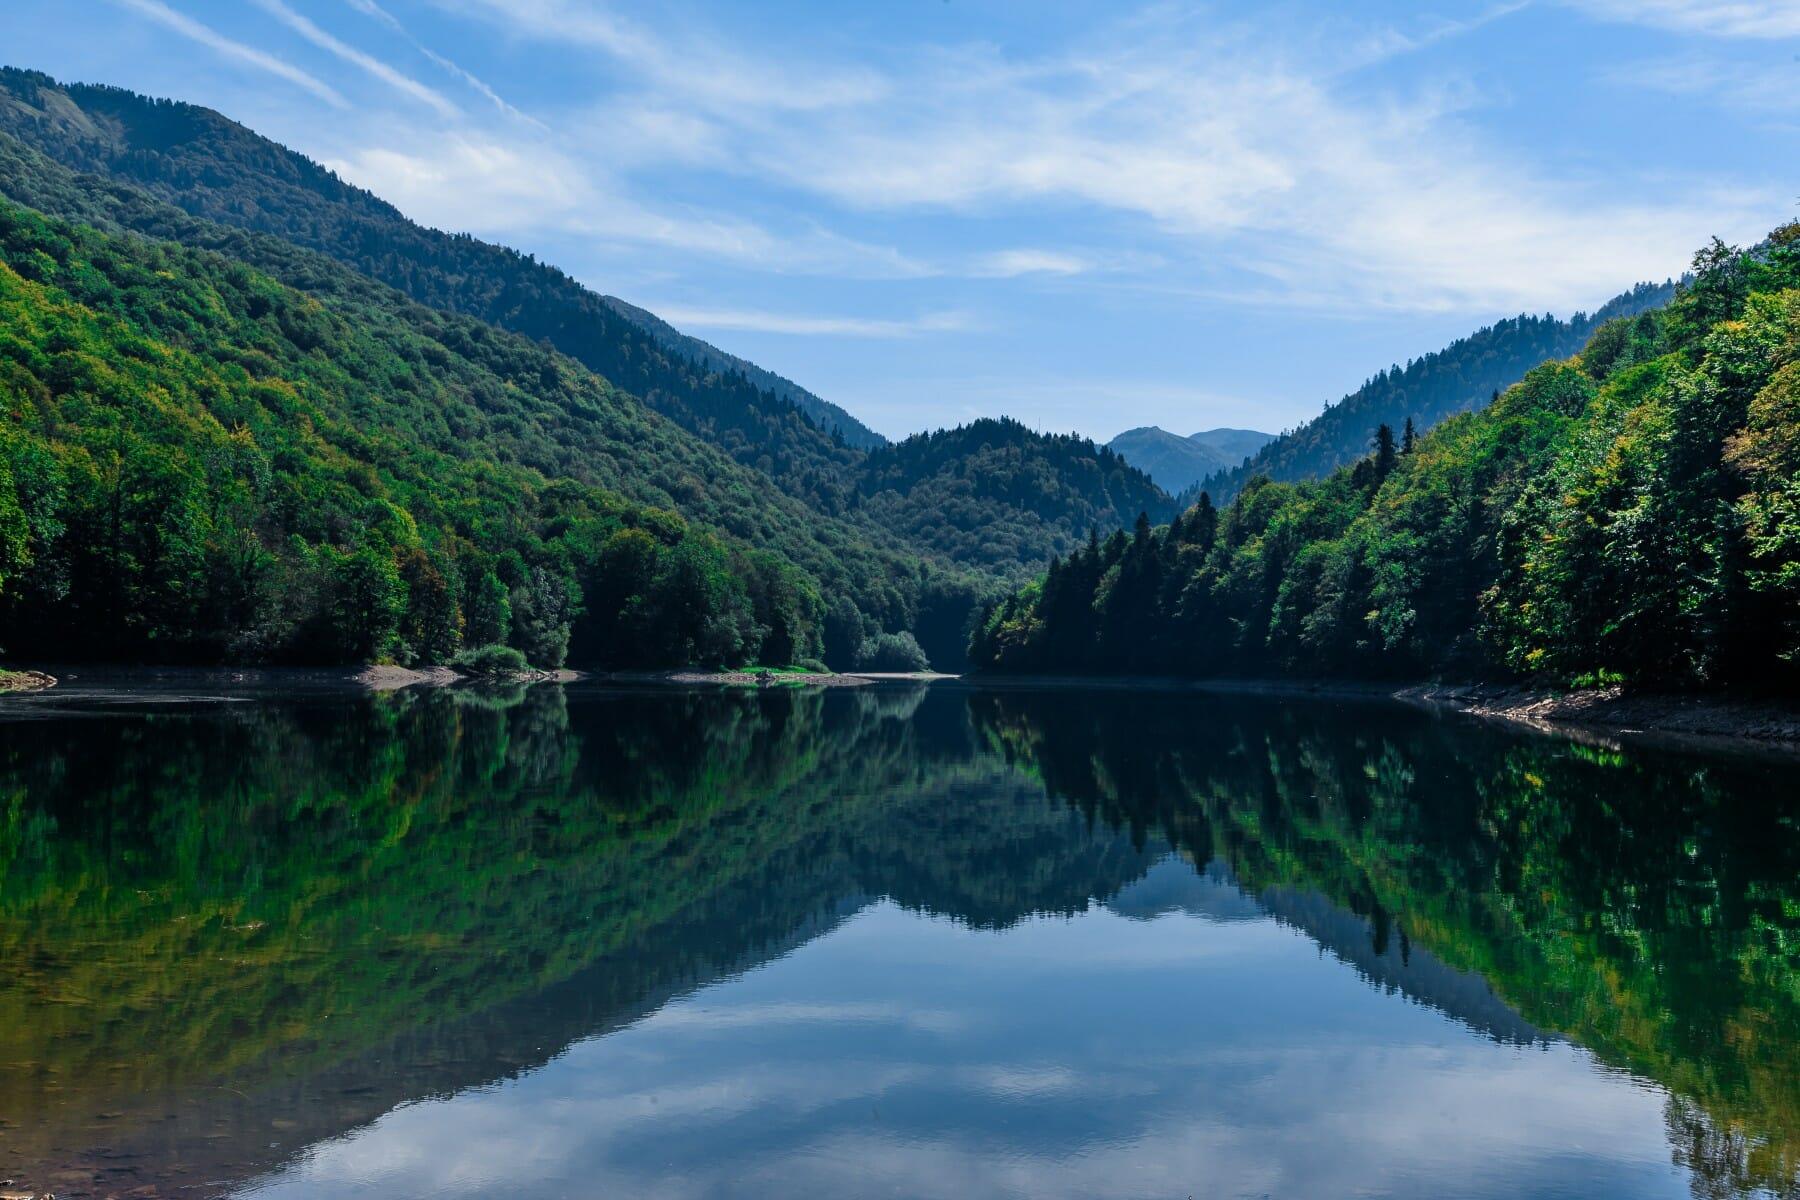 Reflections in Biograd Lake Bjelasica Mountain Montenegro